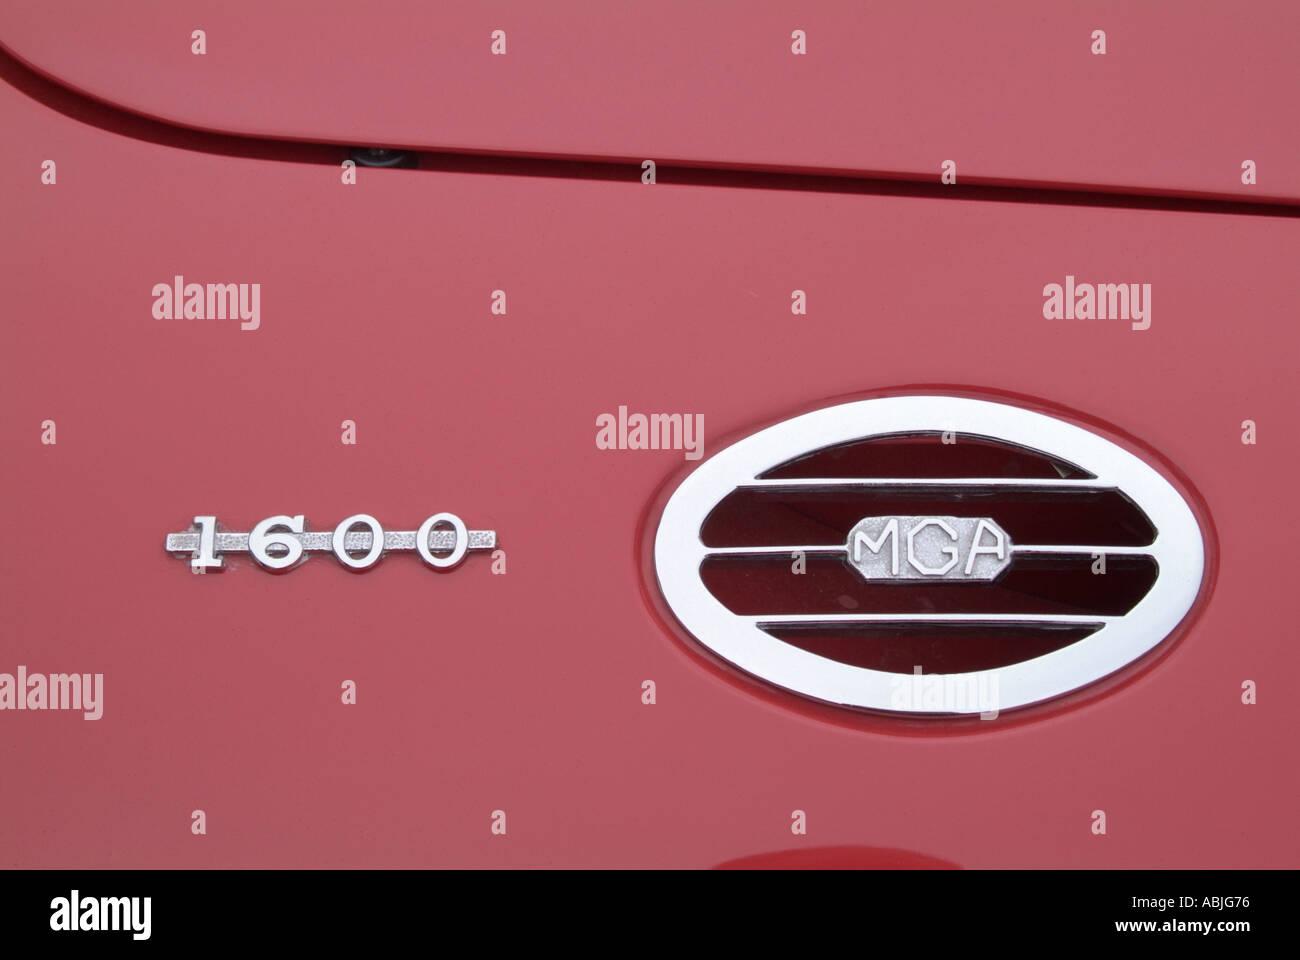 mga vent detail Mg morris garage logo emblem badge red - Stock Image